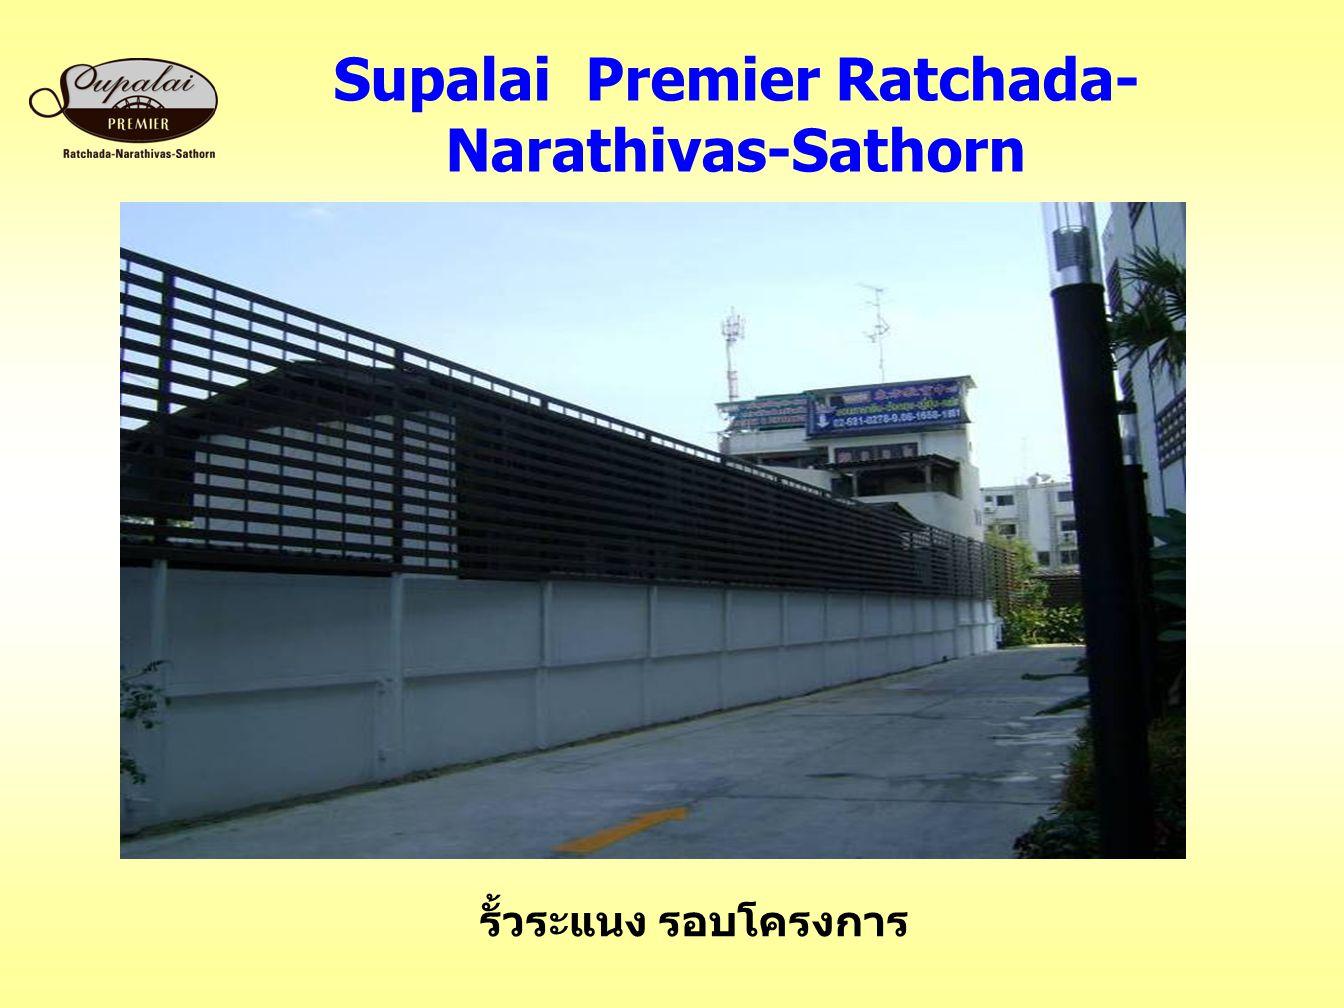 Supalai Premier Ratchada- Narathivas-Sathorn รั้วระแนง รอบโครงการ